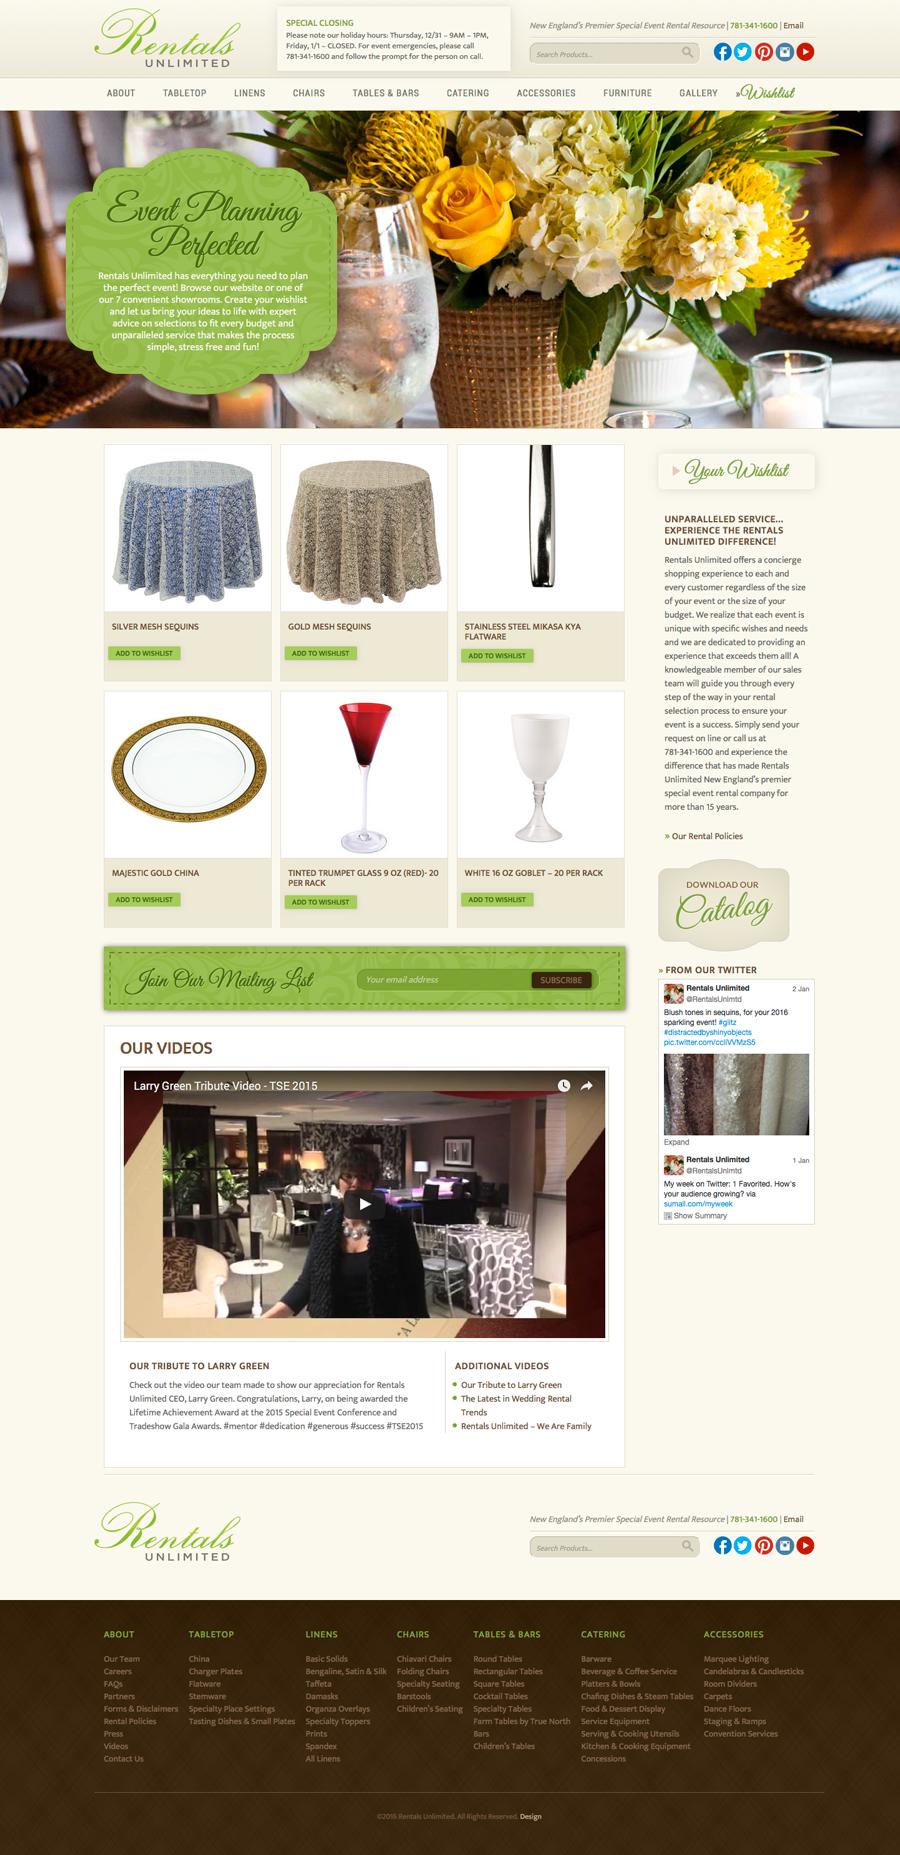 Rentals Unlimited Homepage